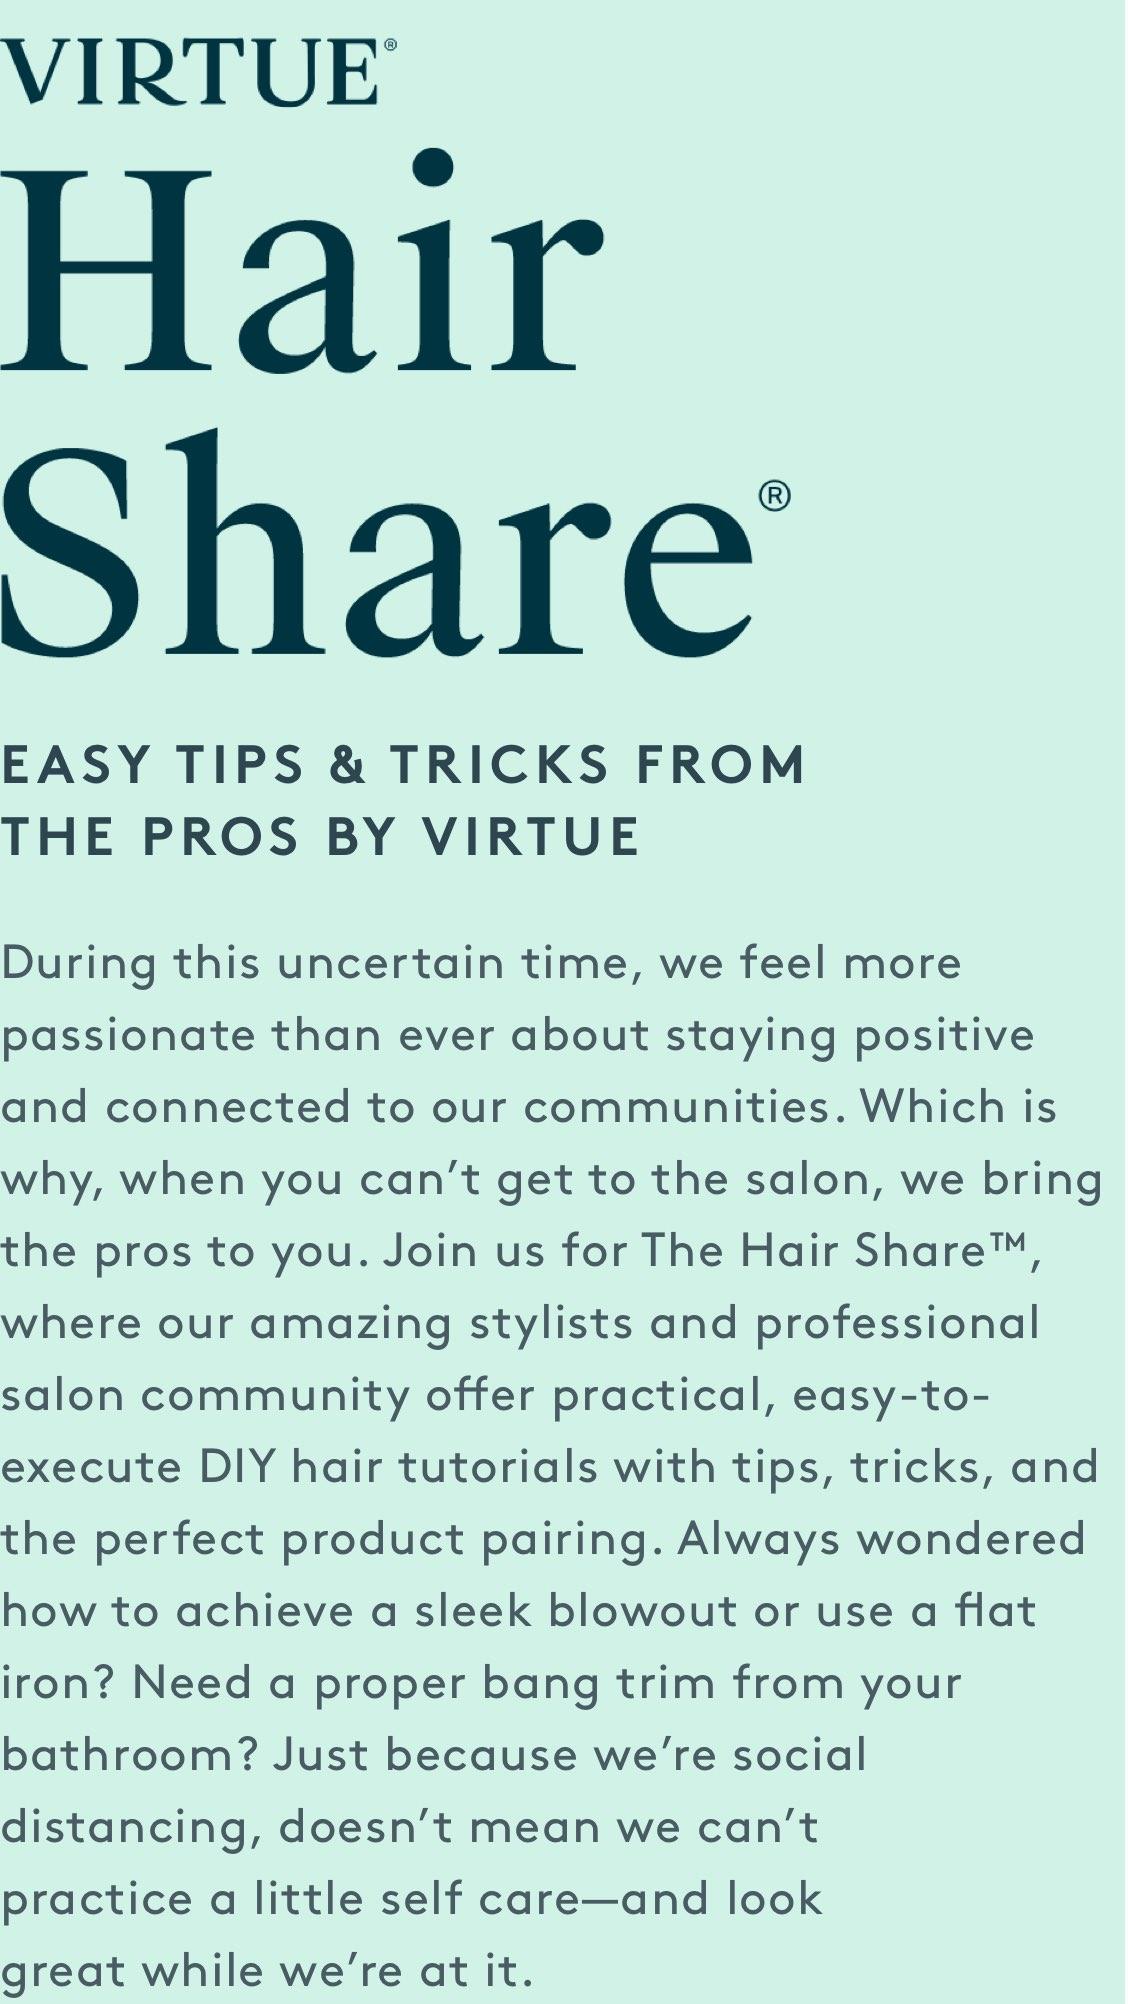 Virtue Hair Share®